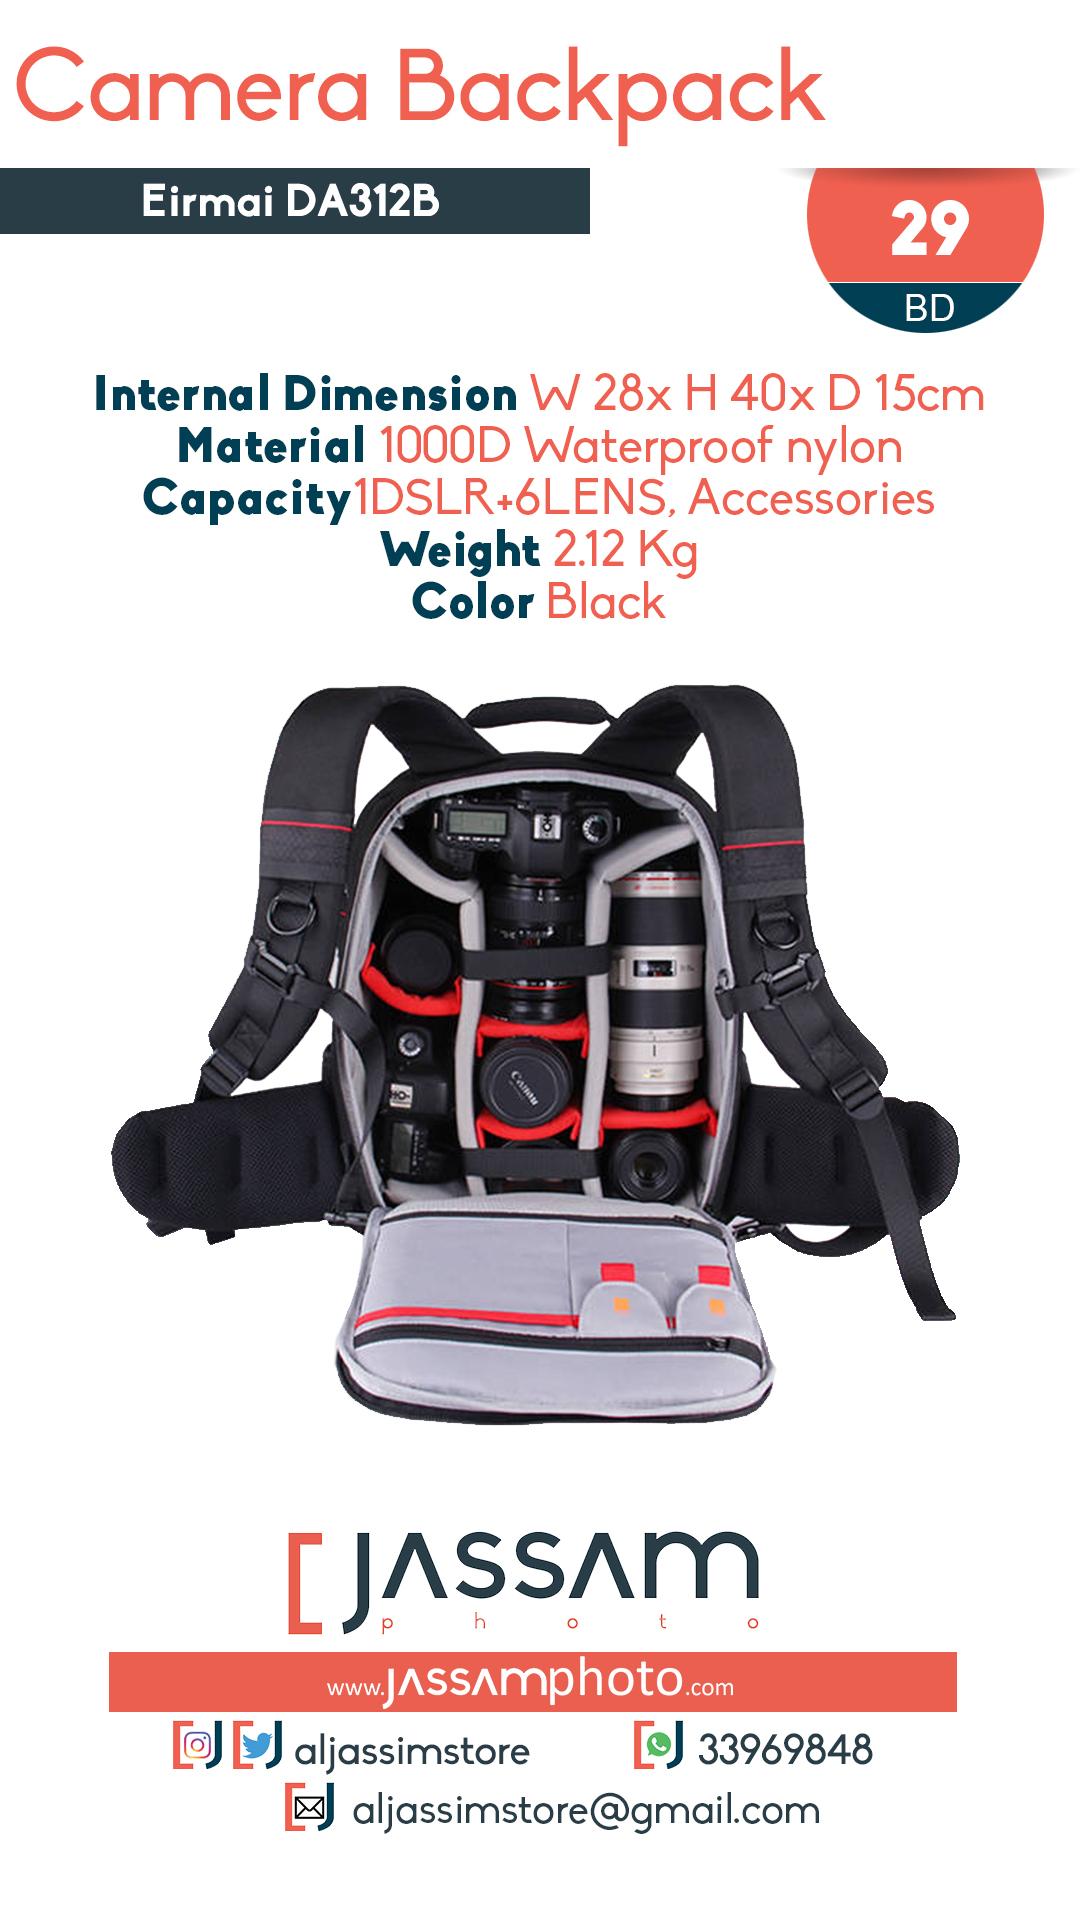 Eirmai Backpack DA312B